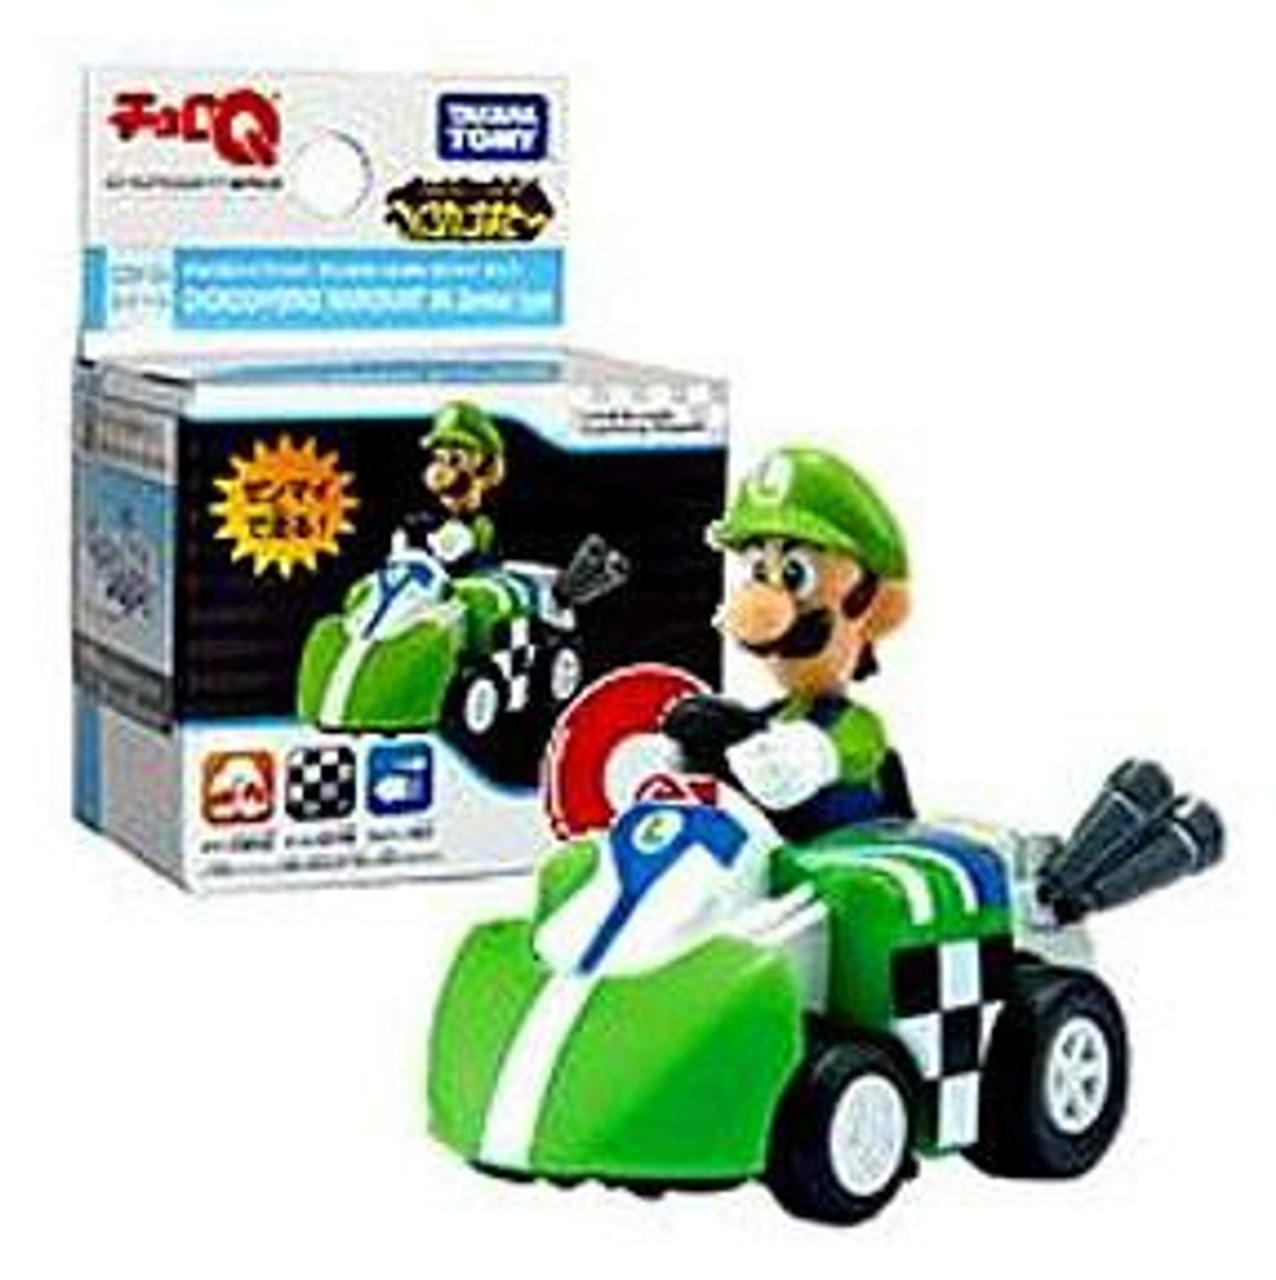 Super Mario Mario Kart Wii Hybrid Pull Back Racer Luigi